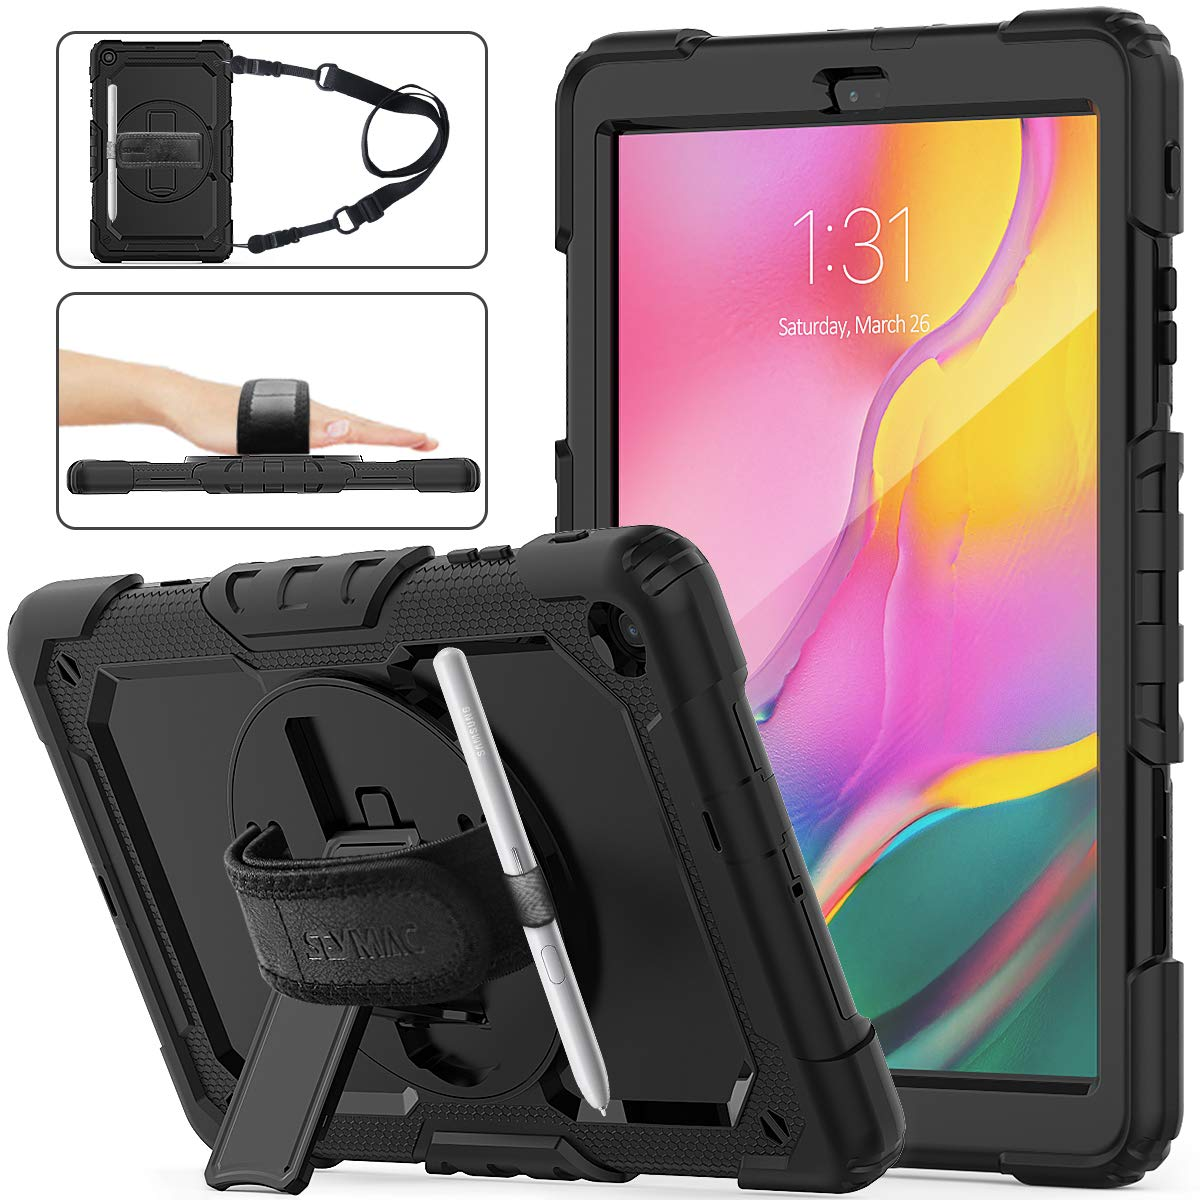 Funda Samsung Galaxy Tab A 10.1 SM-T510 (2019) SEYMAC [7T5KZR9J]